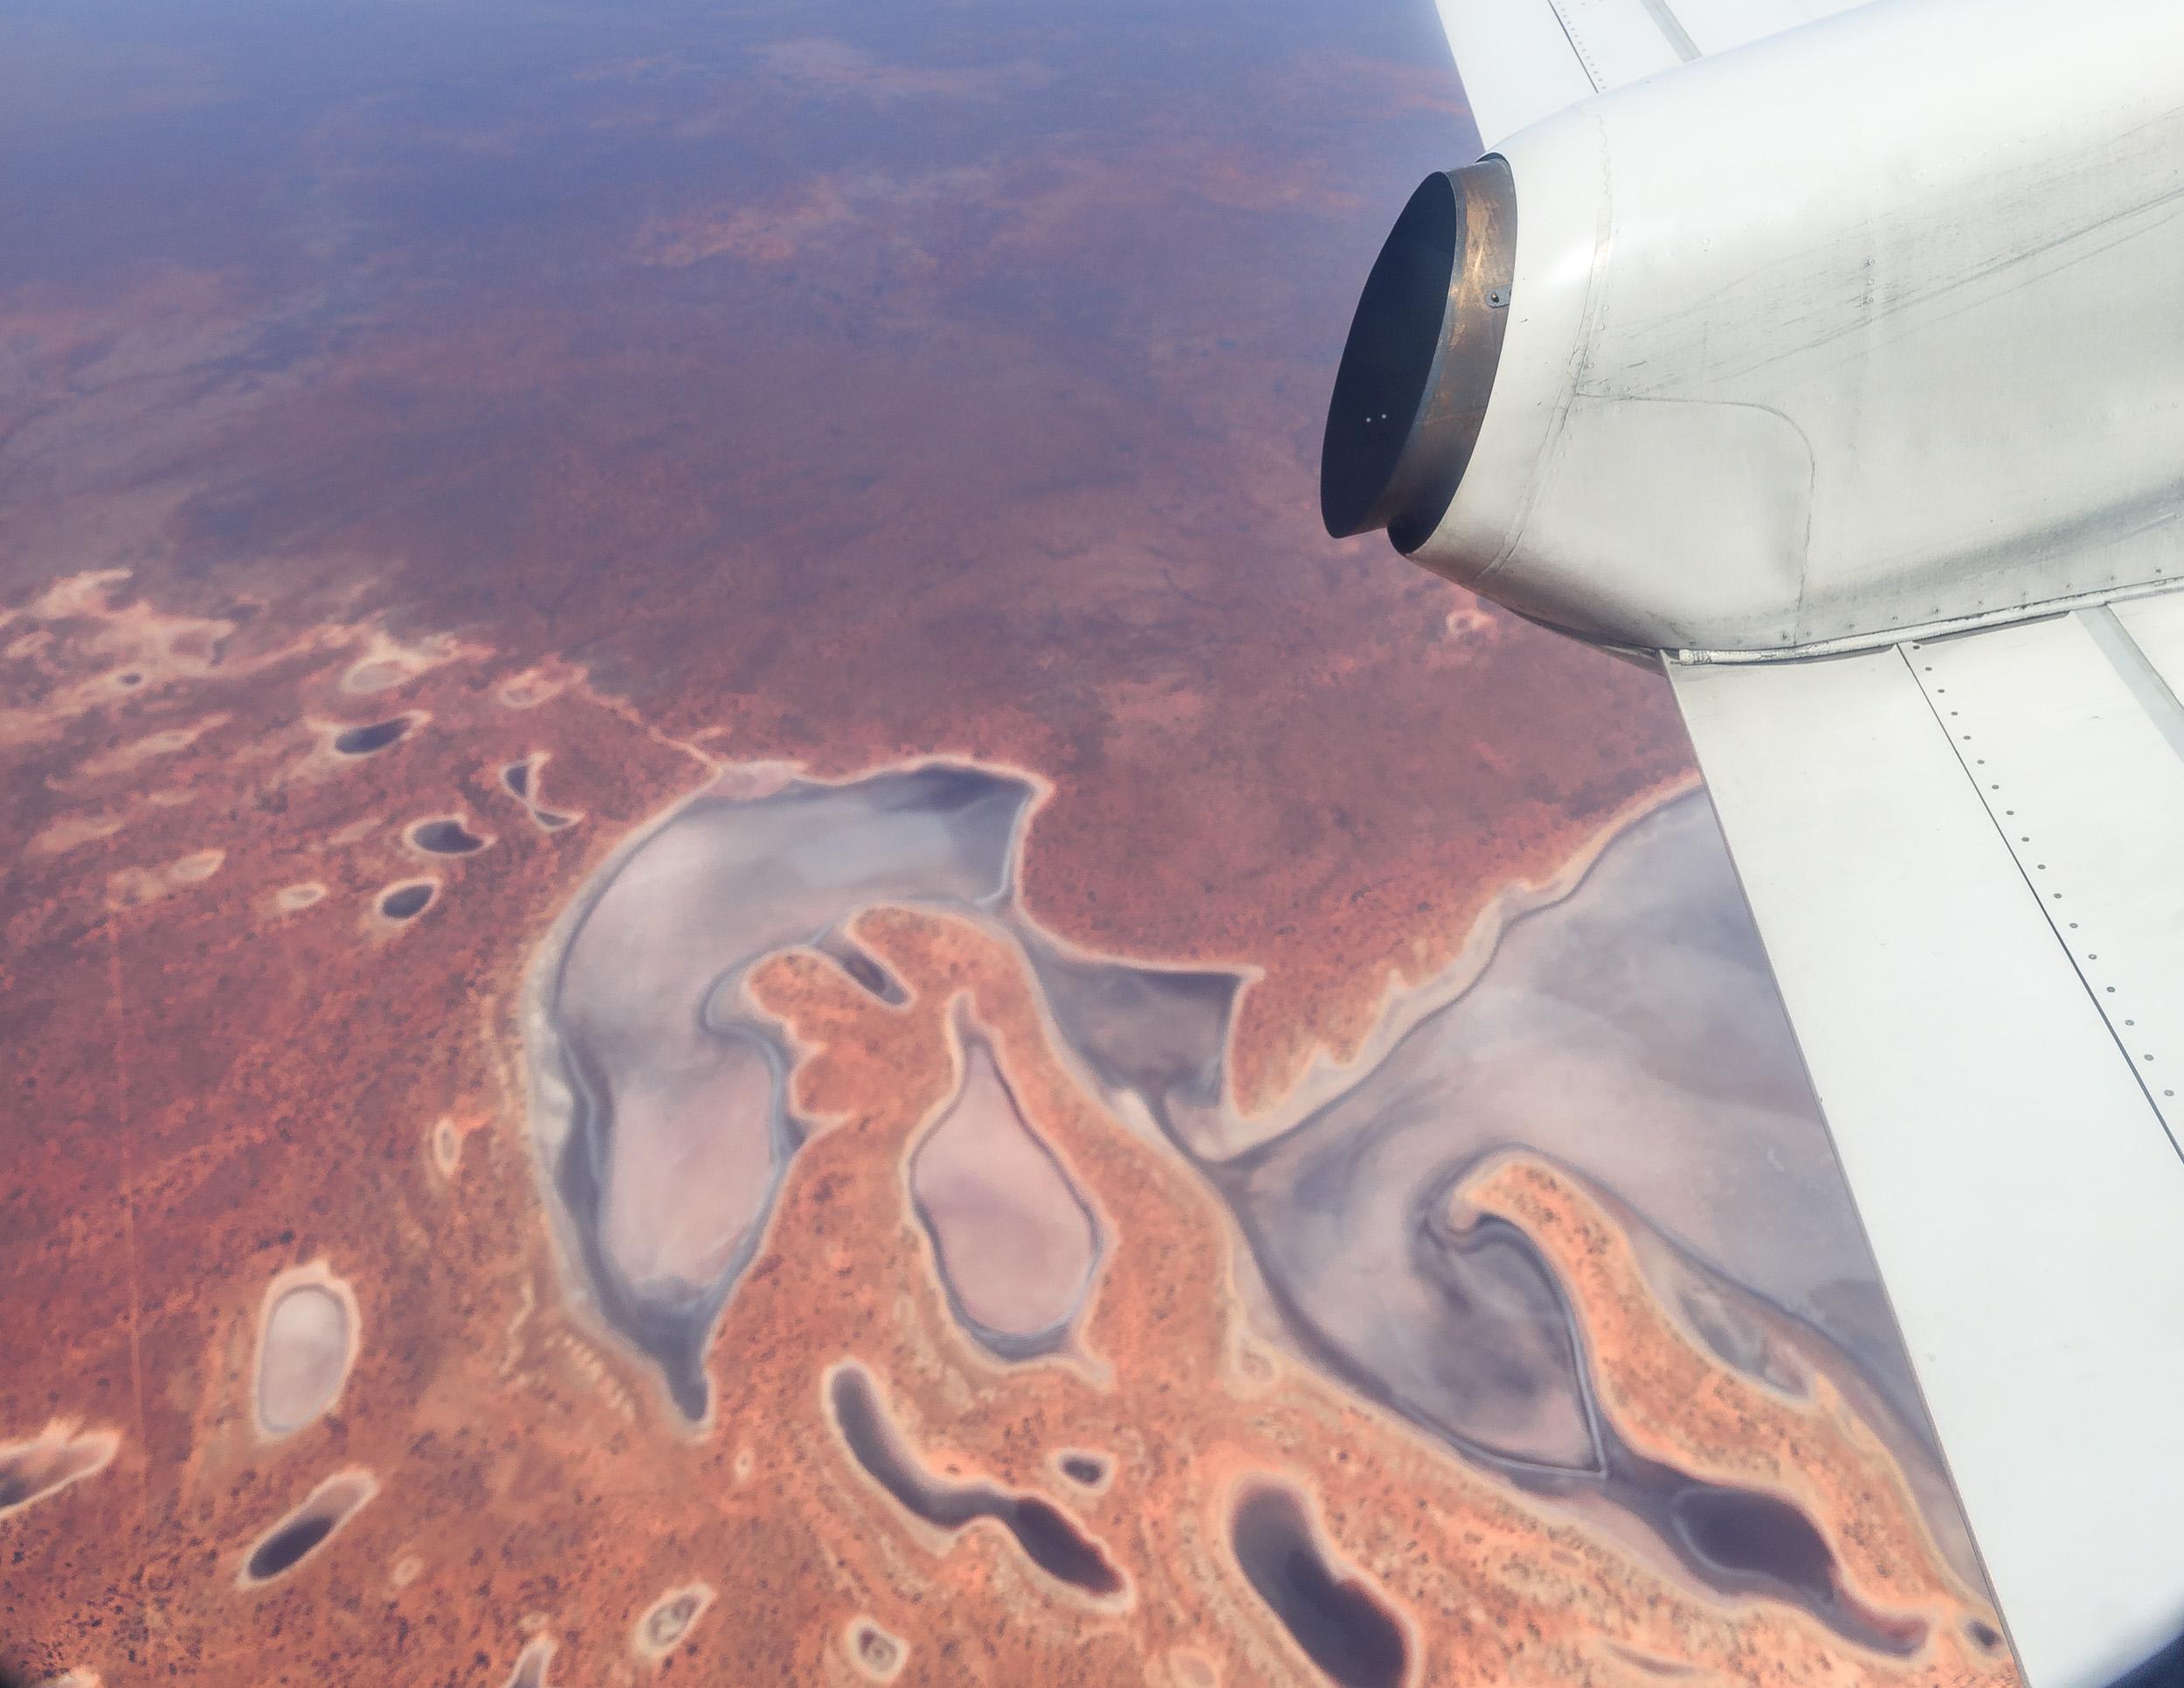 The flight to Coober Pedy, South Australia